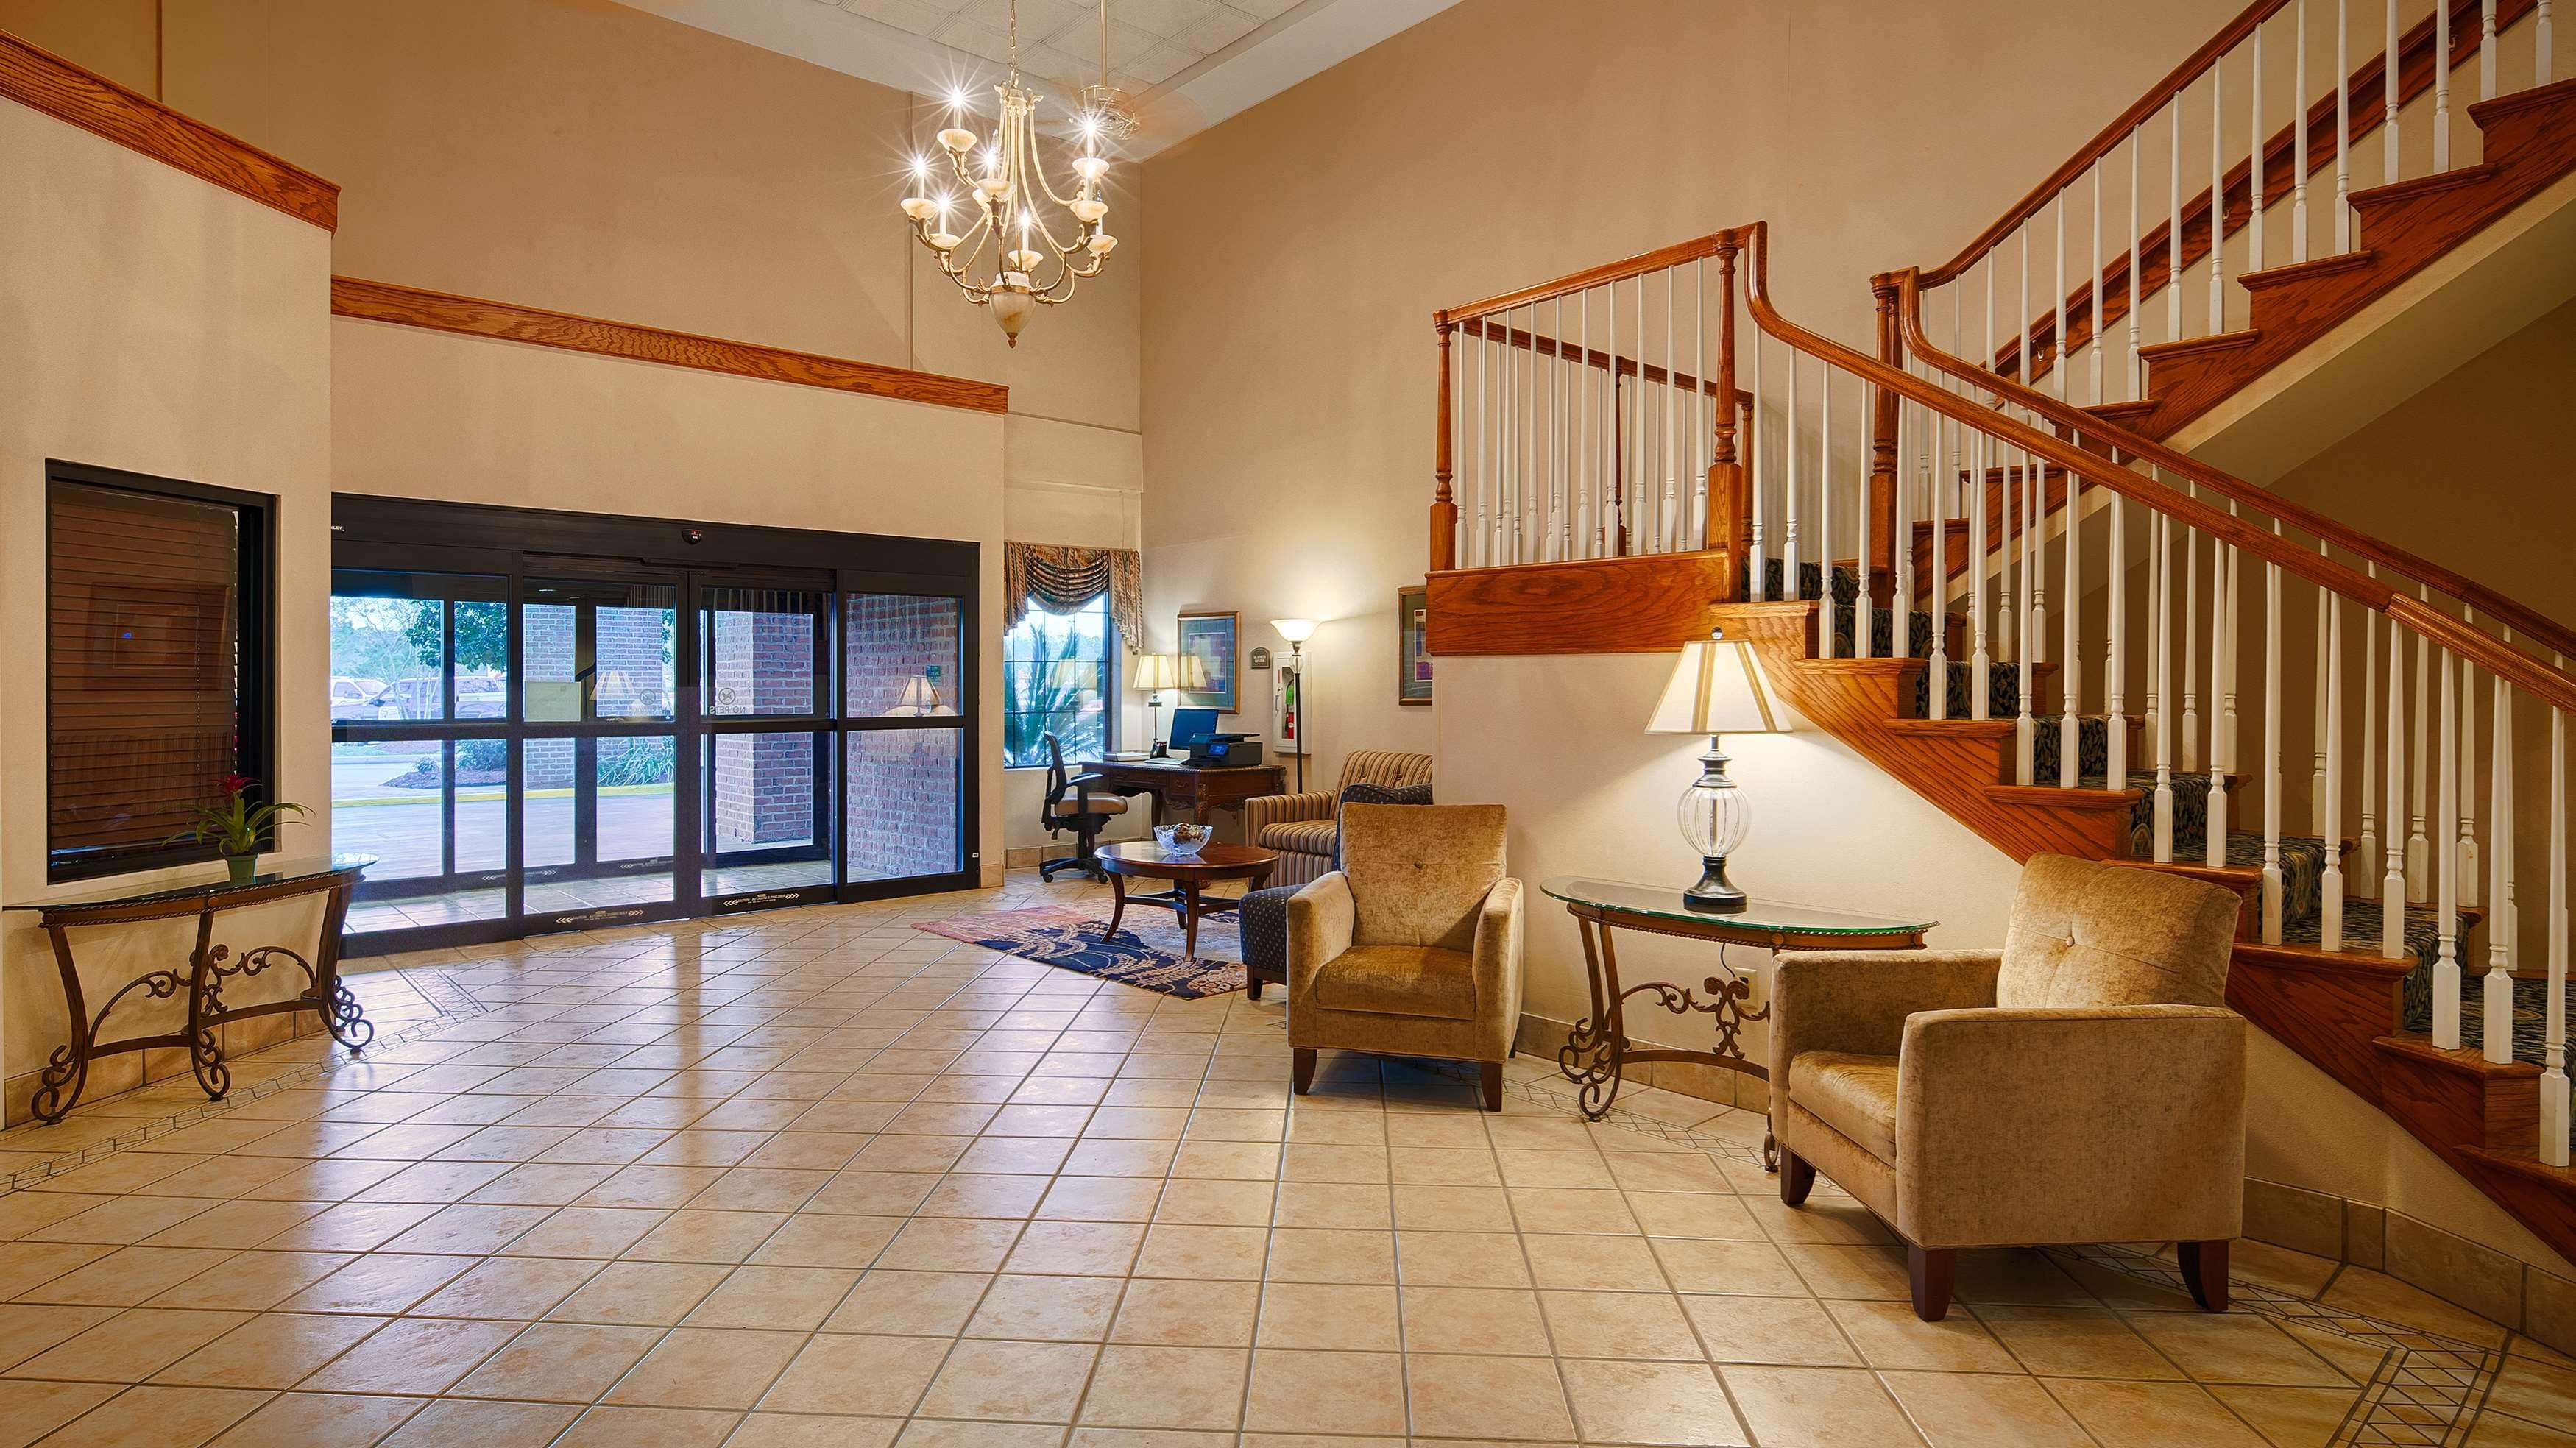 Best Western Plus Executive Hotel & Suites image 31